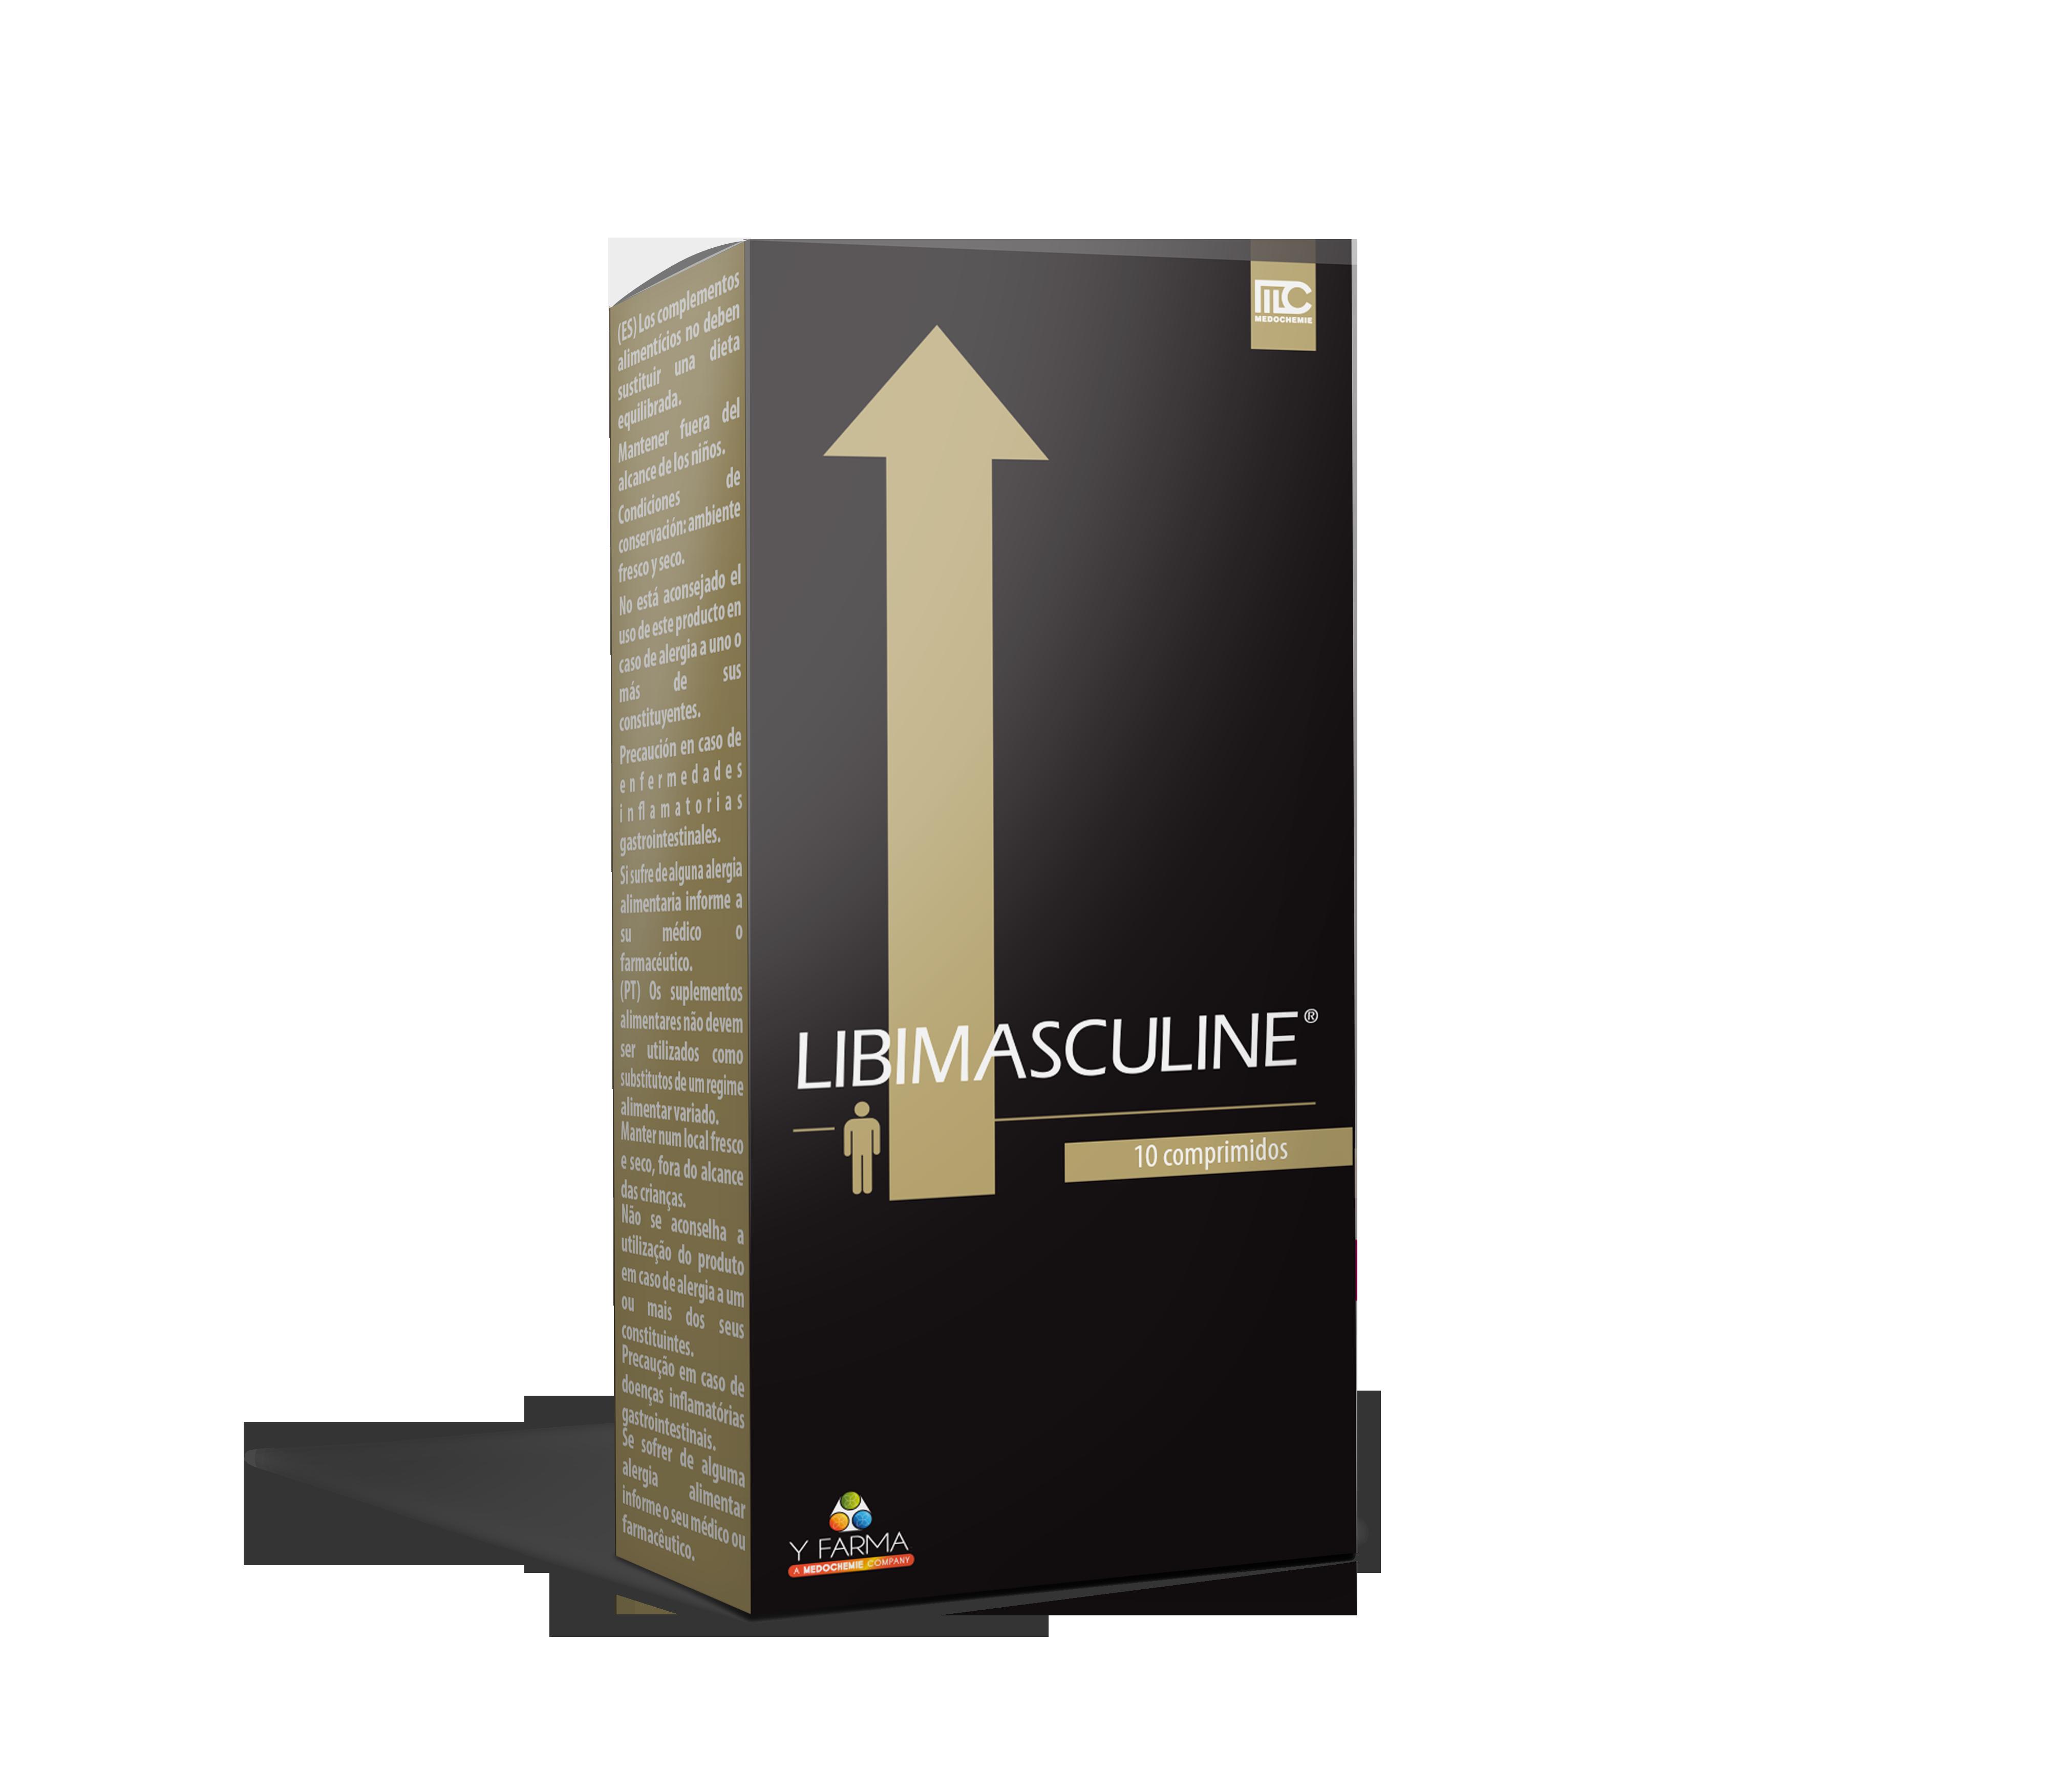 LIBIMASCULINE 10 BOX-ES